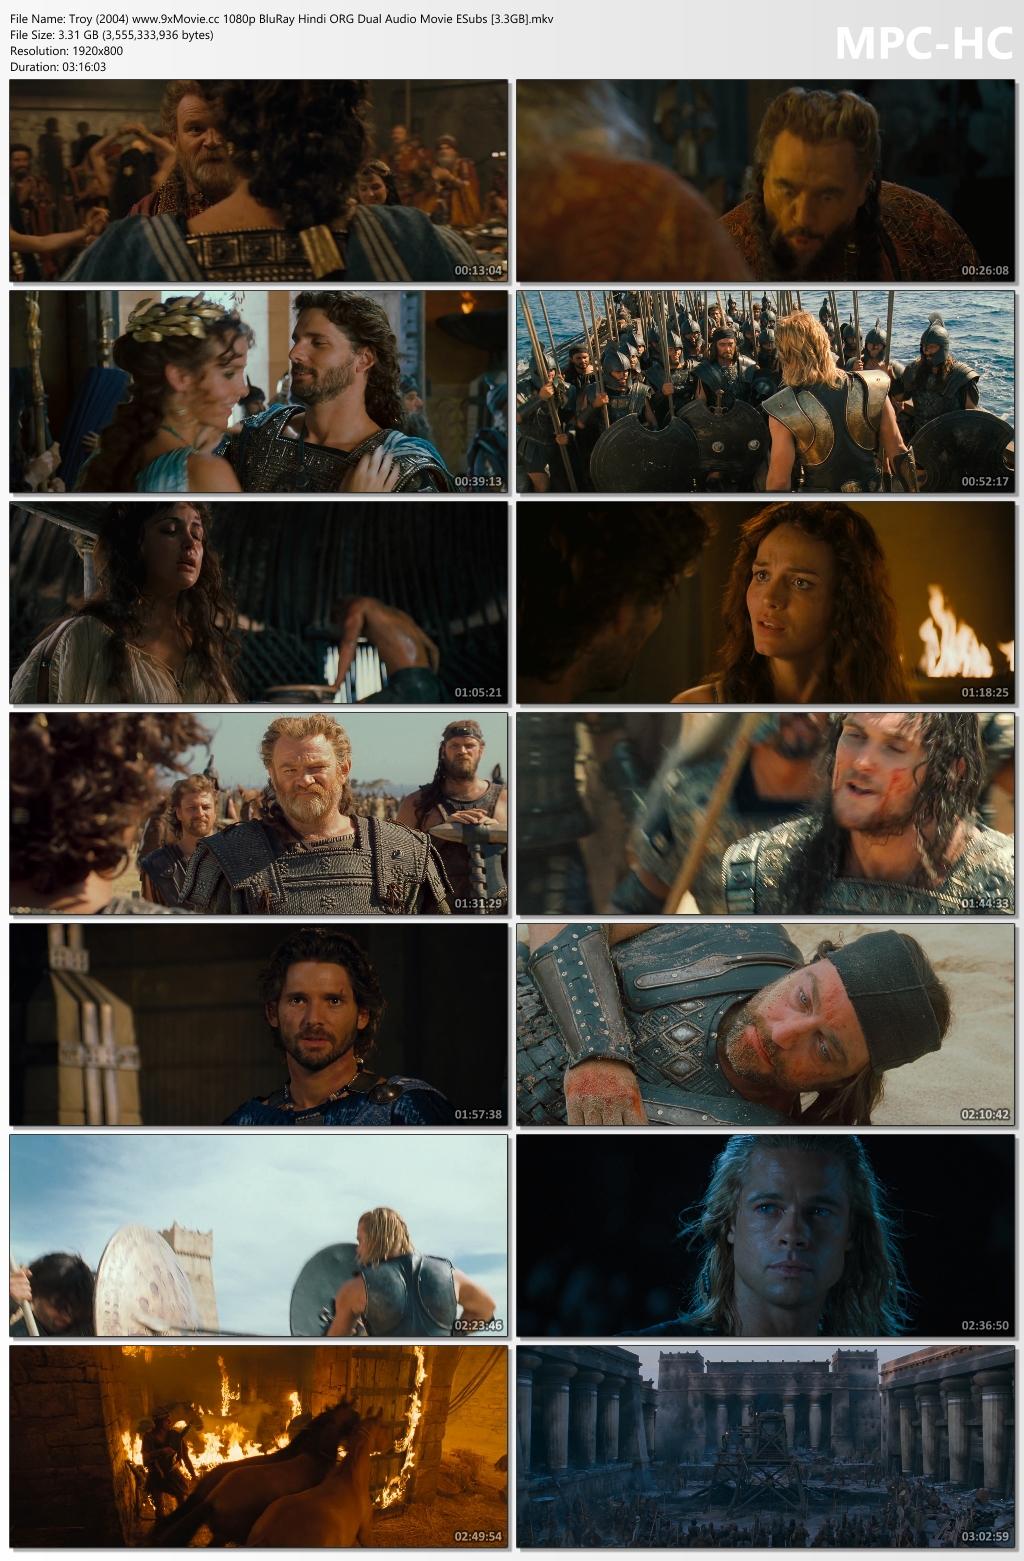 Troy-2004-www-9x-Movie-cc-1080p-Blu-Ray-Hindi-ORG-Dual-Audio-Movie-ESubs-3-3-GB-mkv